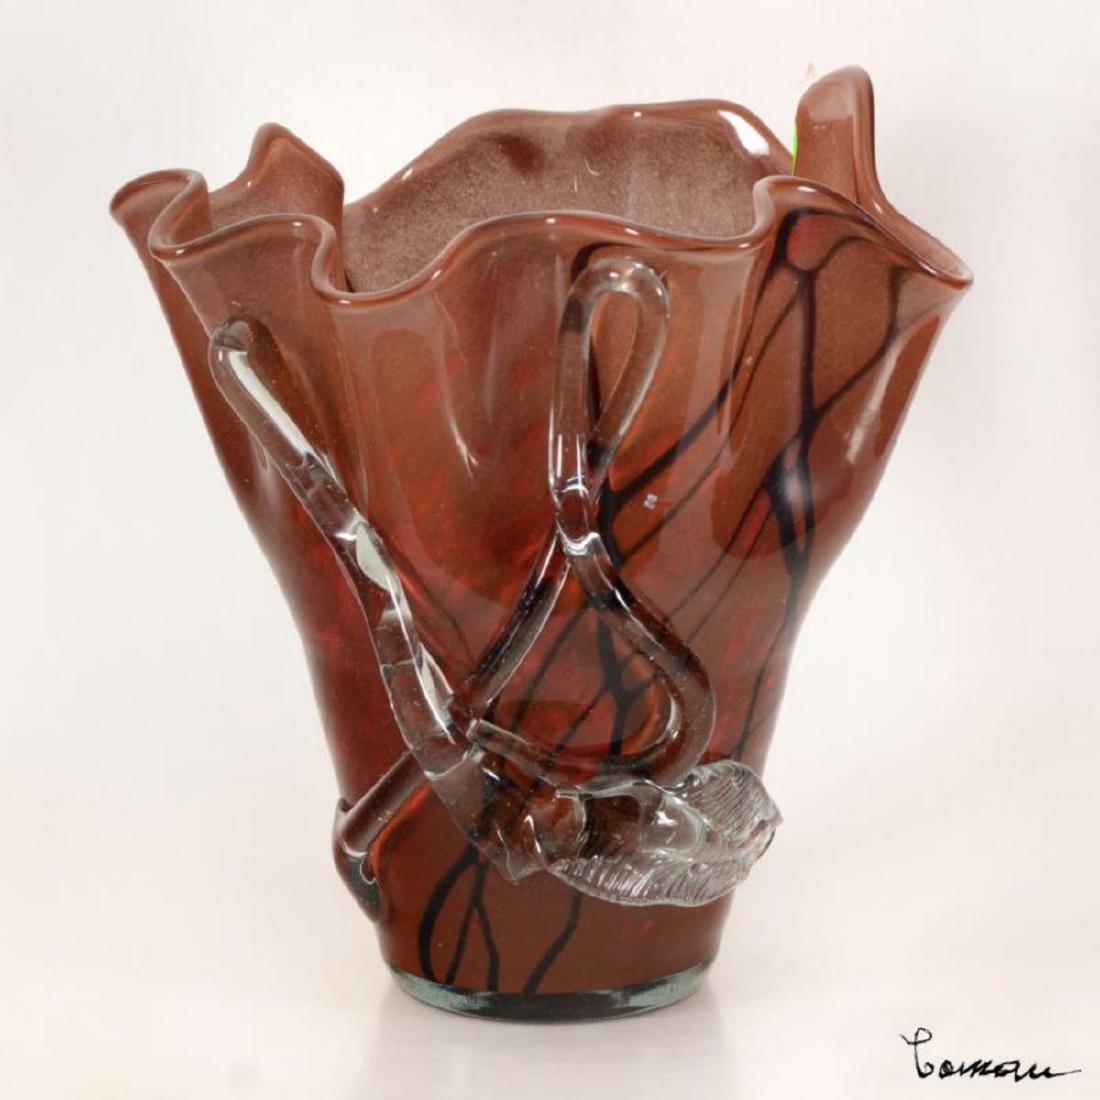 Coman, Hand Blown Glass Vase Sculpture, Hand Signed.